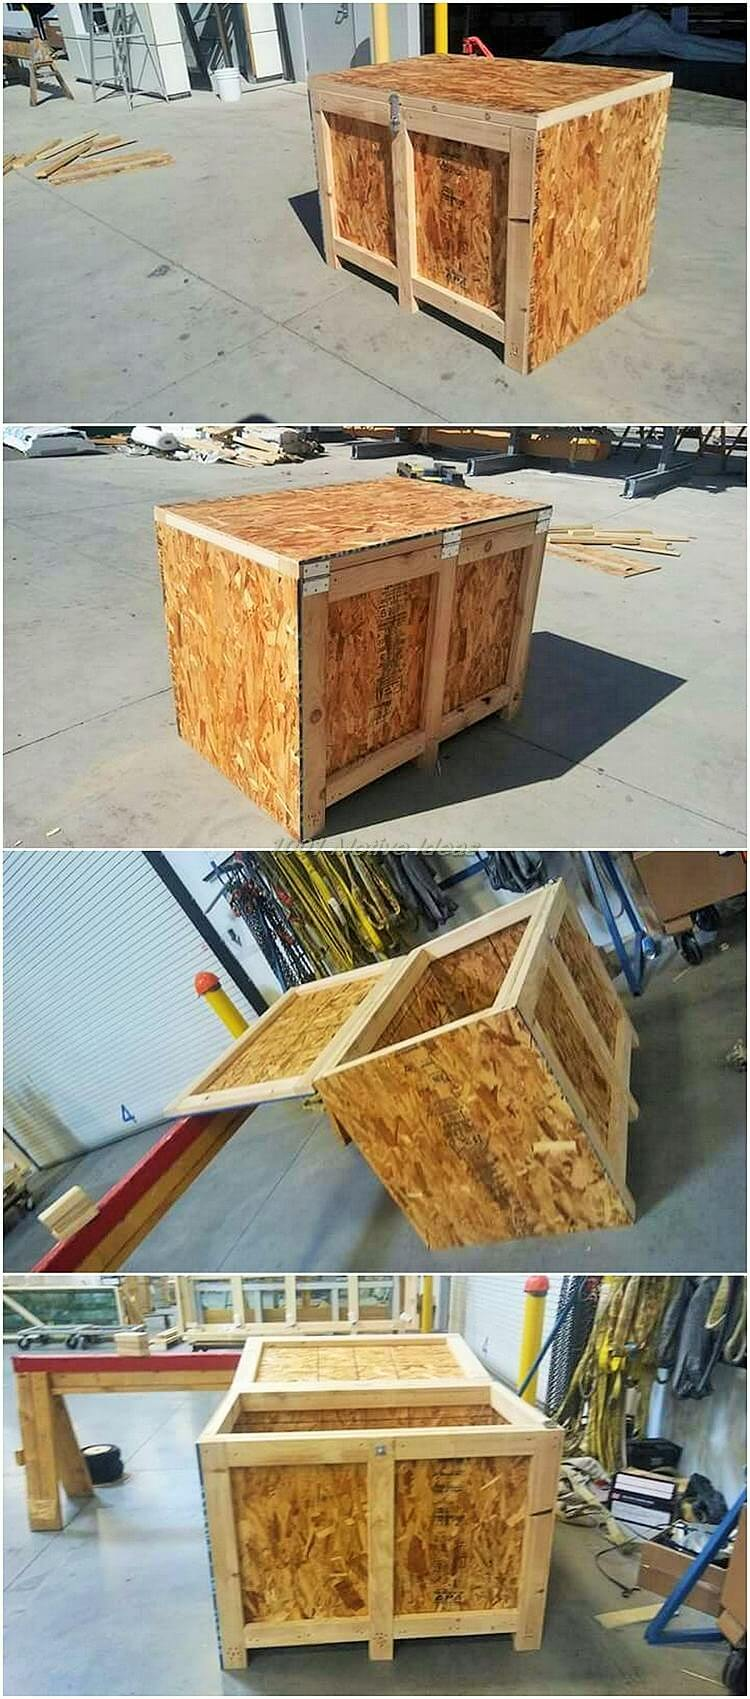 wooden-Pallet-Kitchen-furniture-Project-Ideas-002